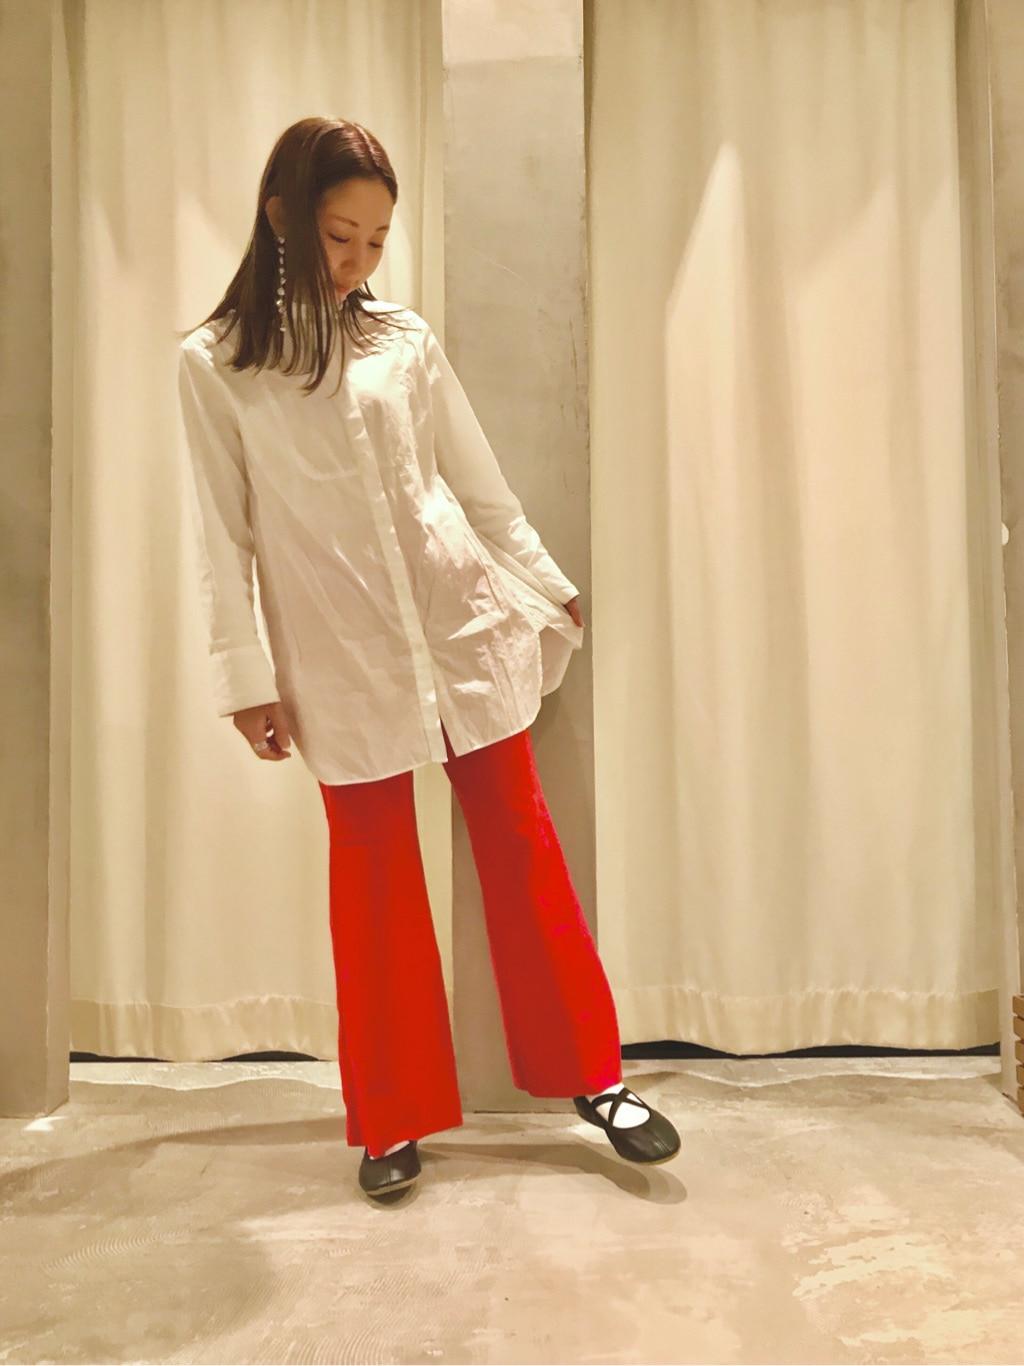 Dot and Stripes CHILD WOMAN ルミネ池袋 身長:155cm 2020.03.03